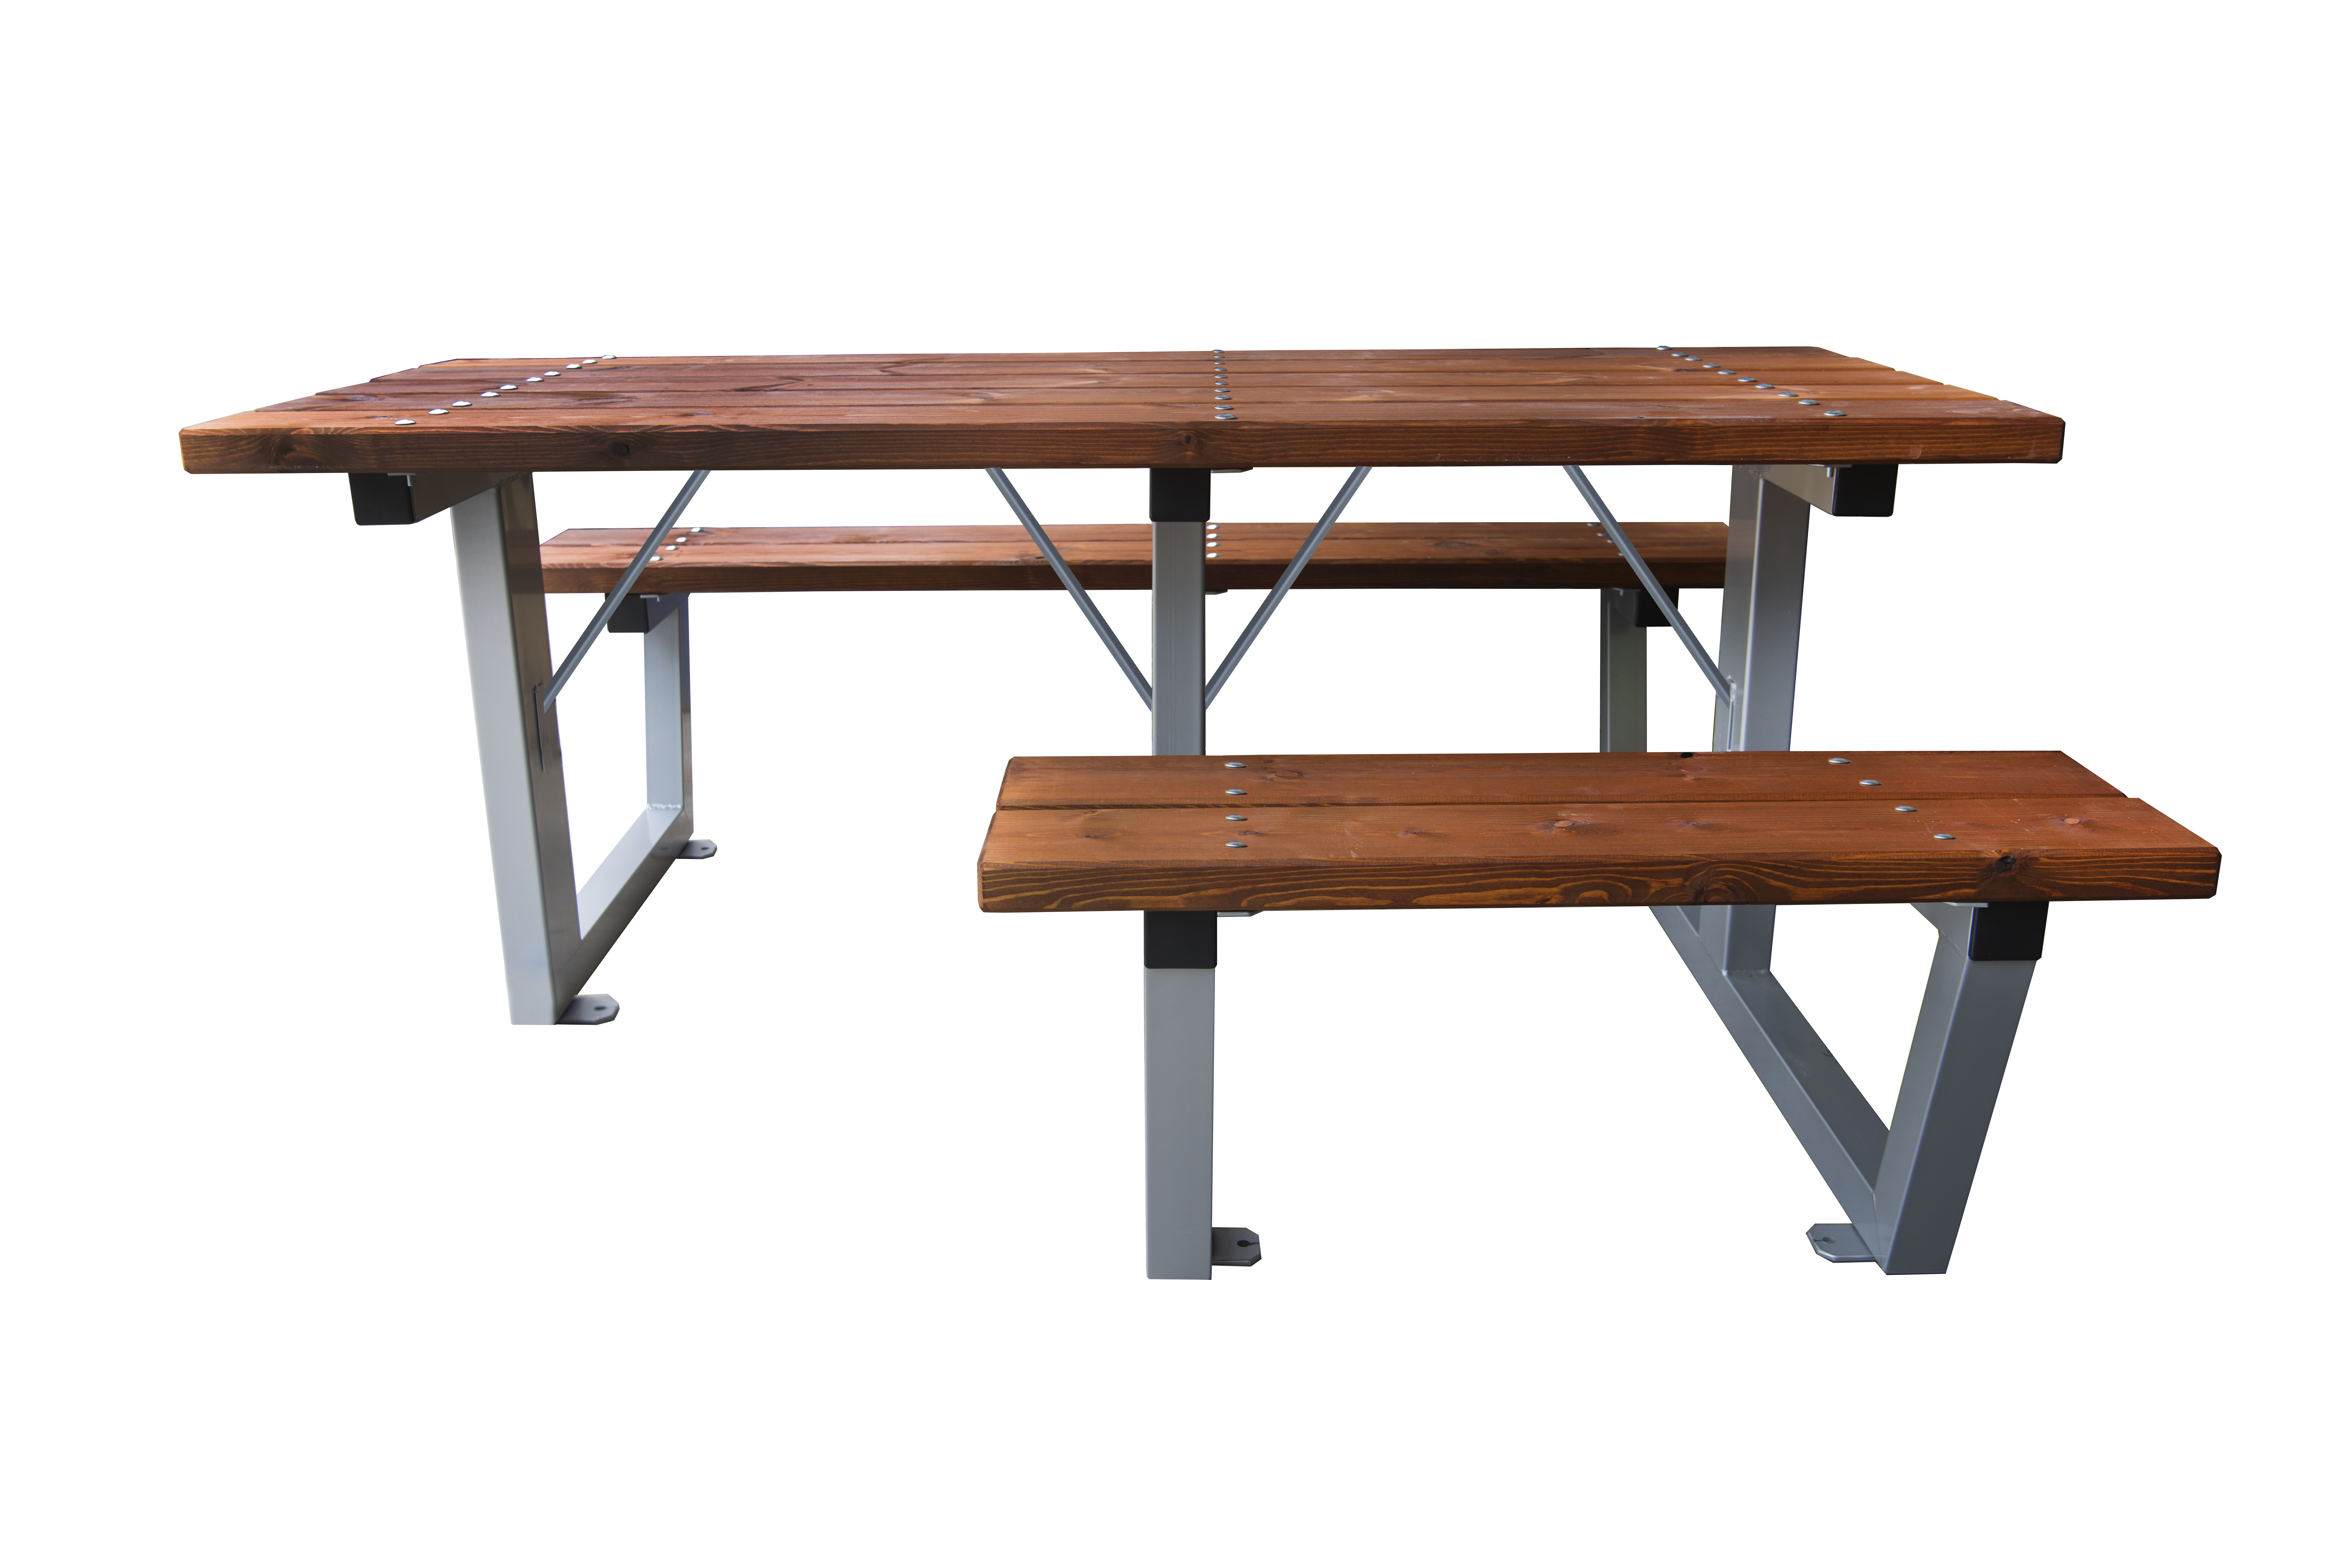 Mesa de picnic Acero/Madera adaptada para silla de ruedas